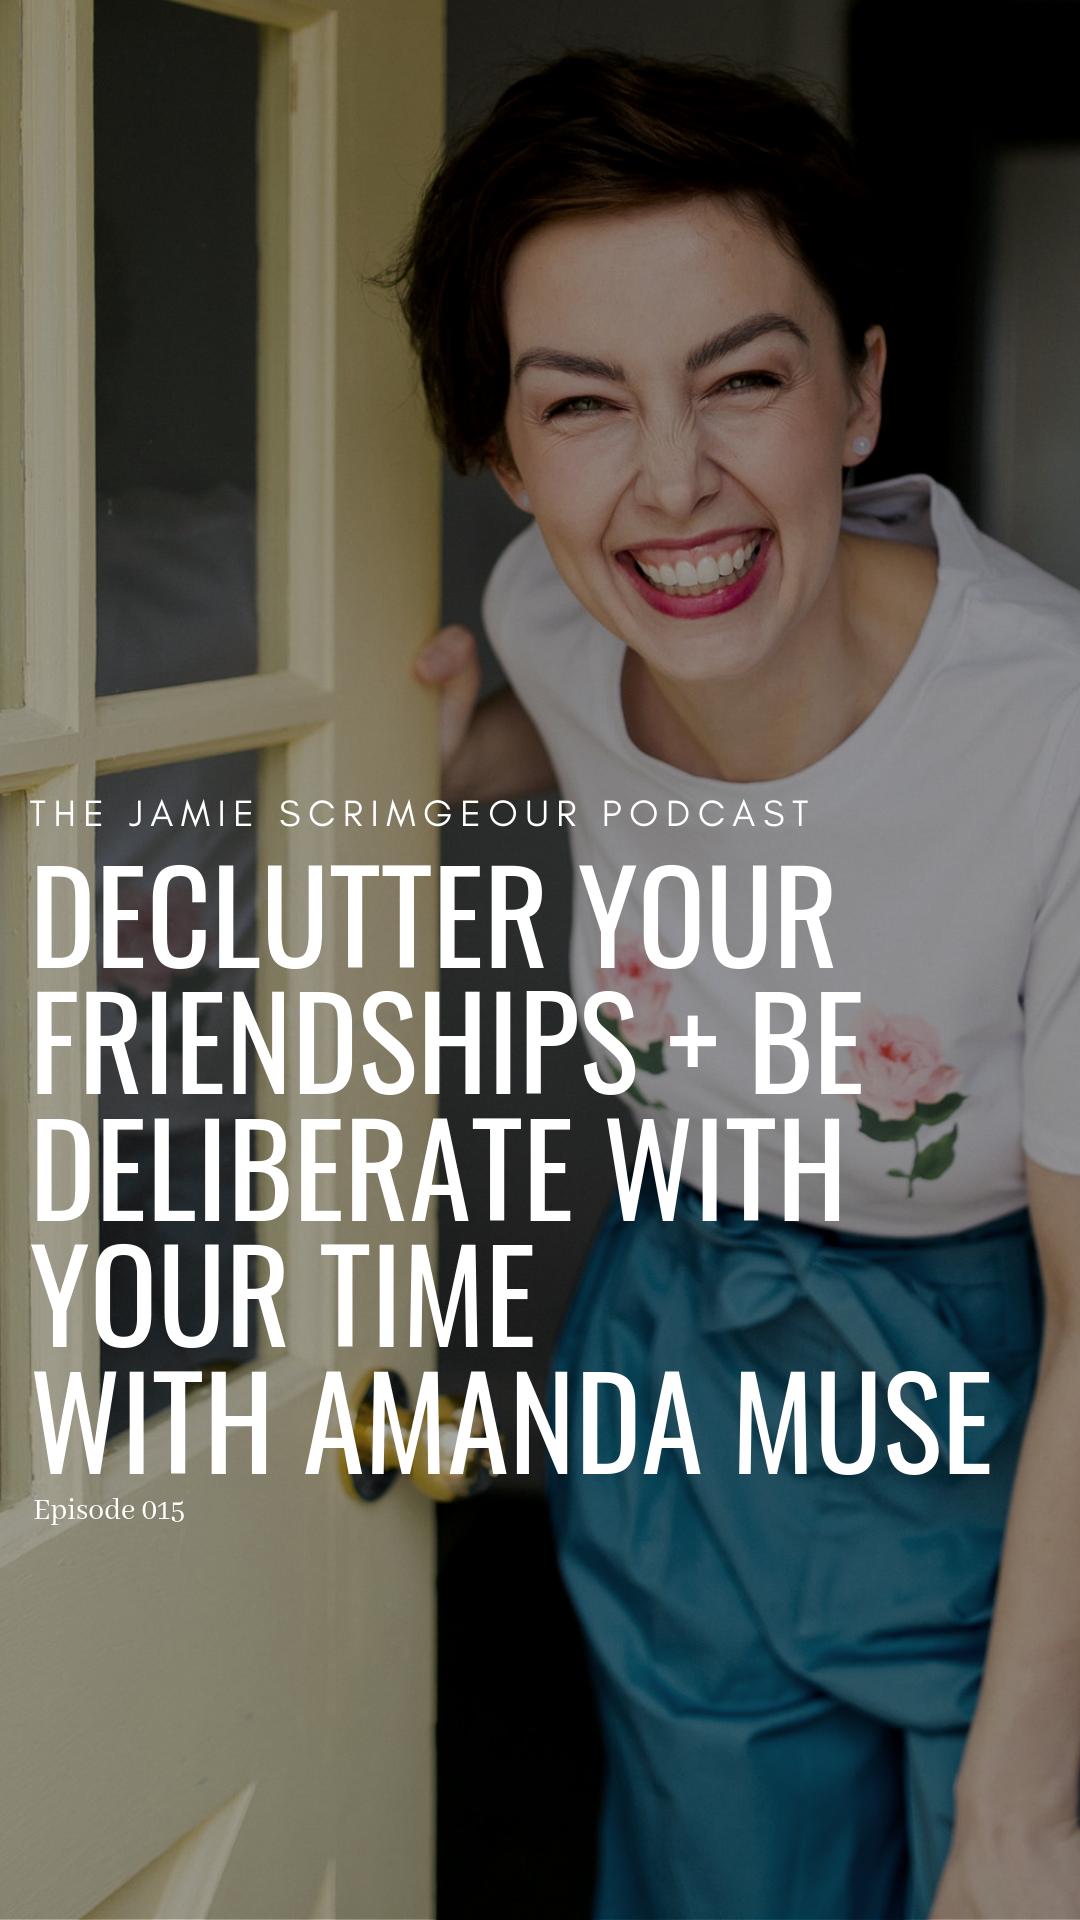 The Jamie Scrimgeour Podcast - Amanda Muse